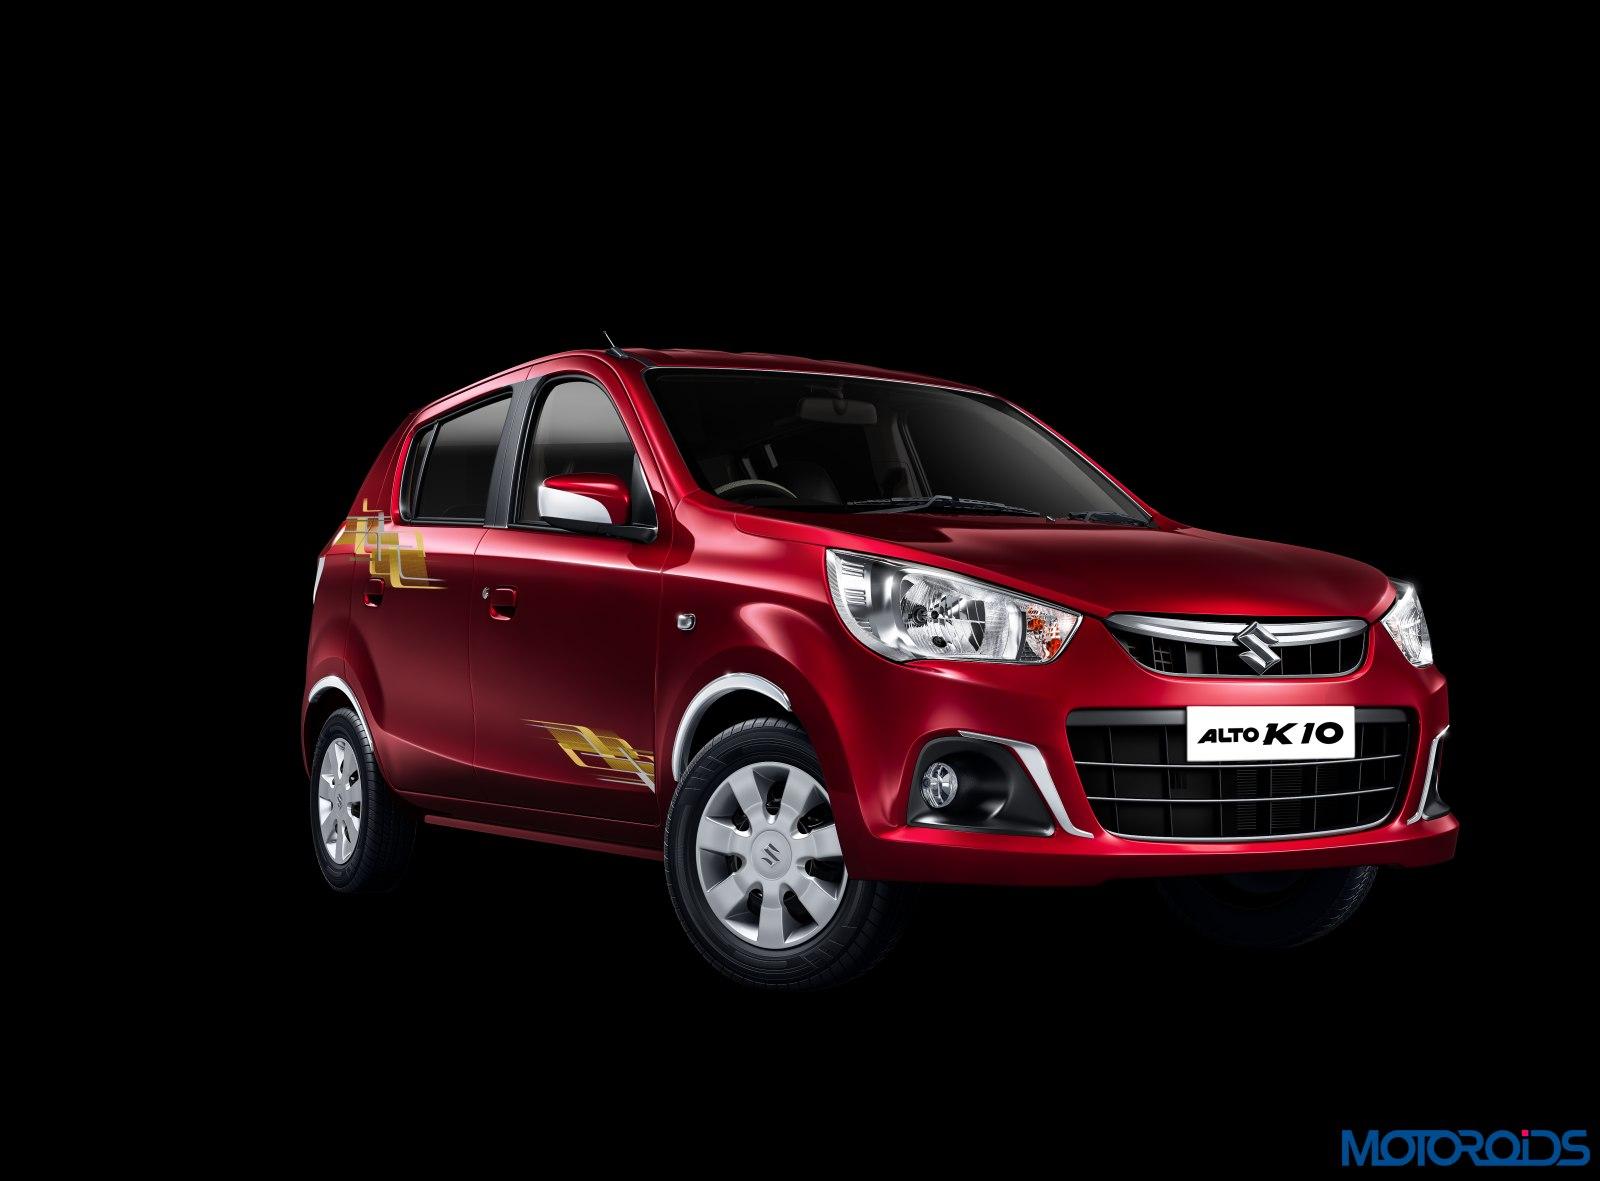 Suzuki Car Dealership >> Maruti Suzuki launches Alto K10 Urbano : A ploy to attract prospective KWID buyers? | Motoroids